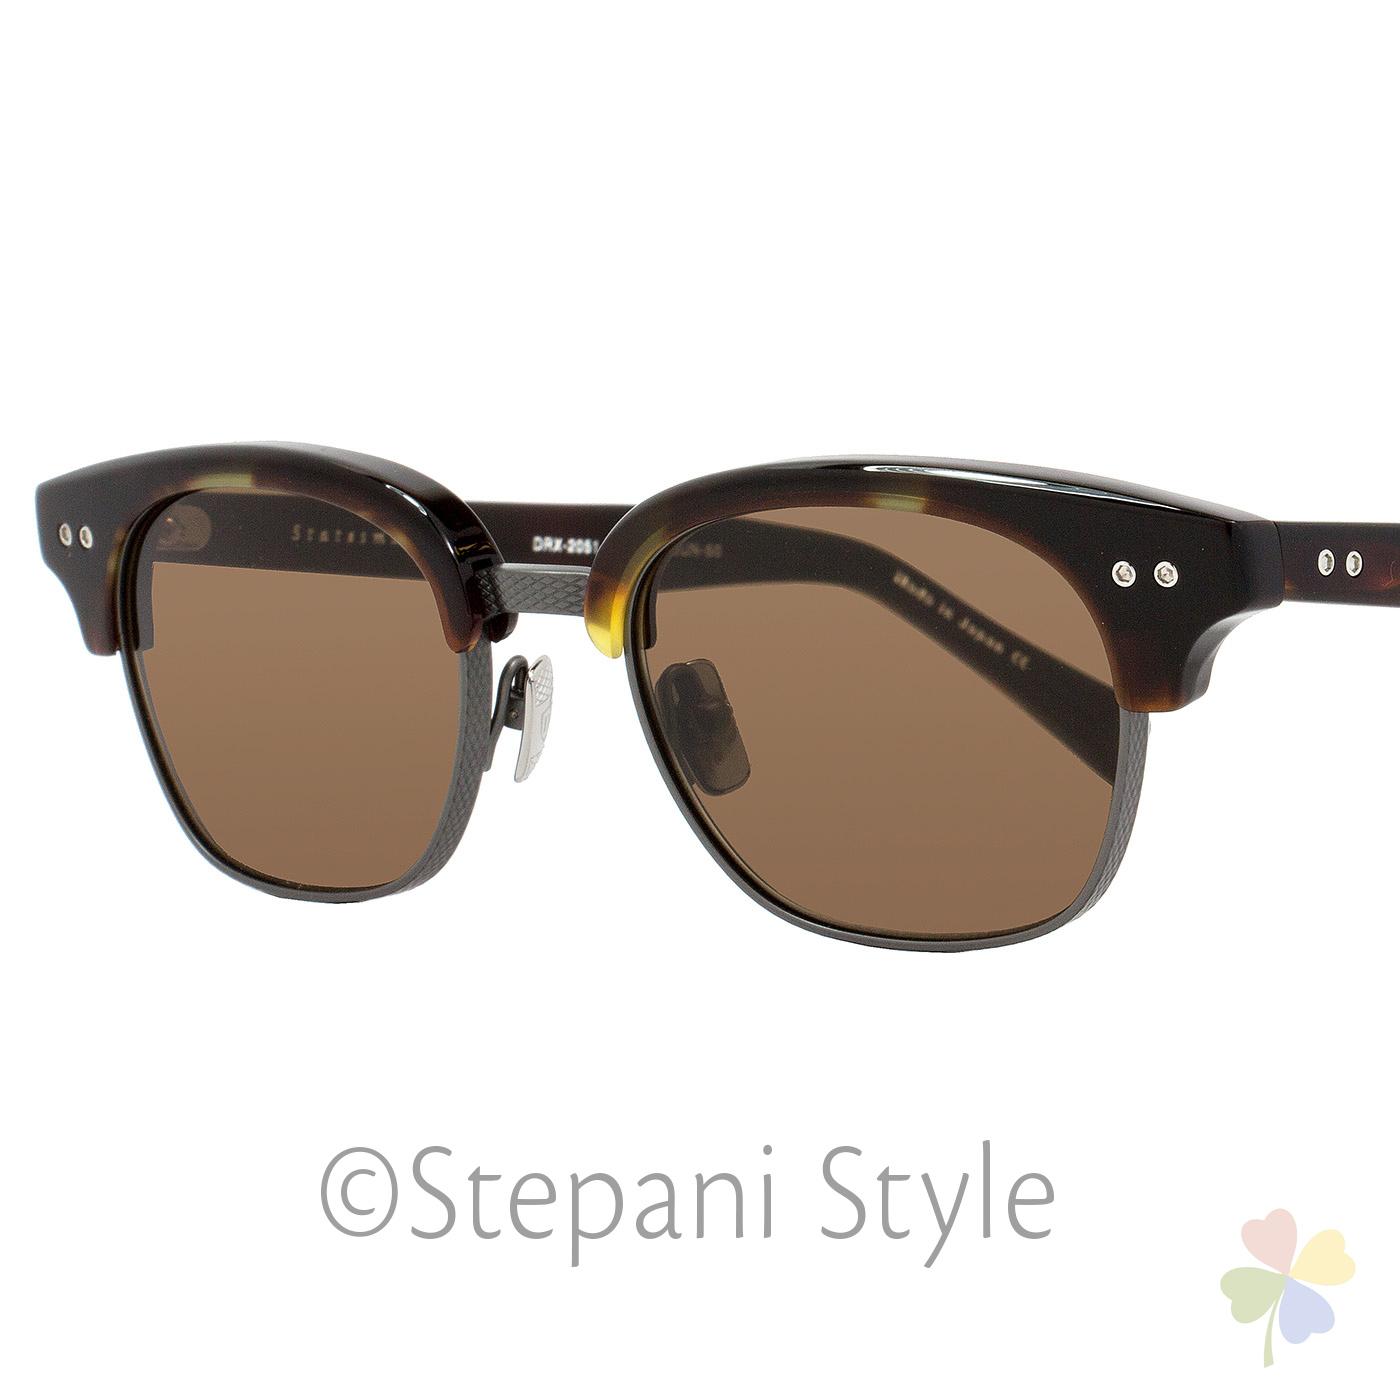 74cf80d2a754 Dita Oval Sunglasses DRX-2051 Statesman Two E-T-TRT-GUN Tortoise Gunmetal